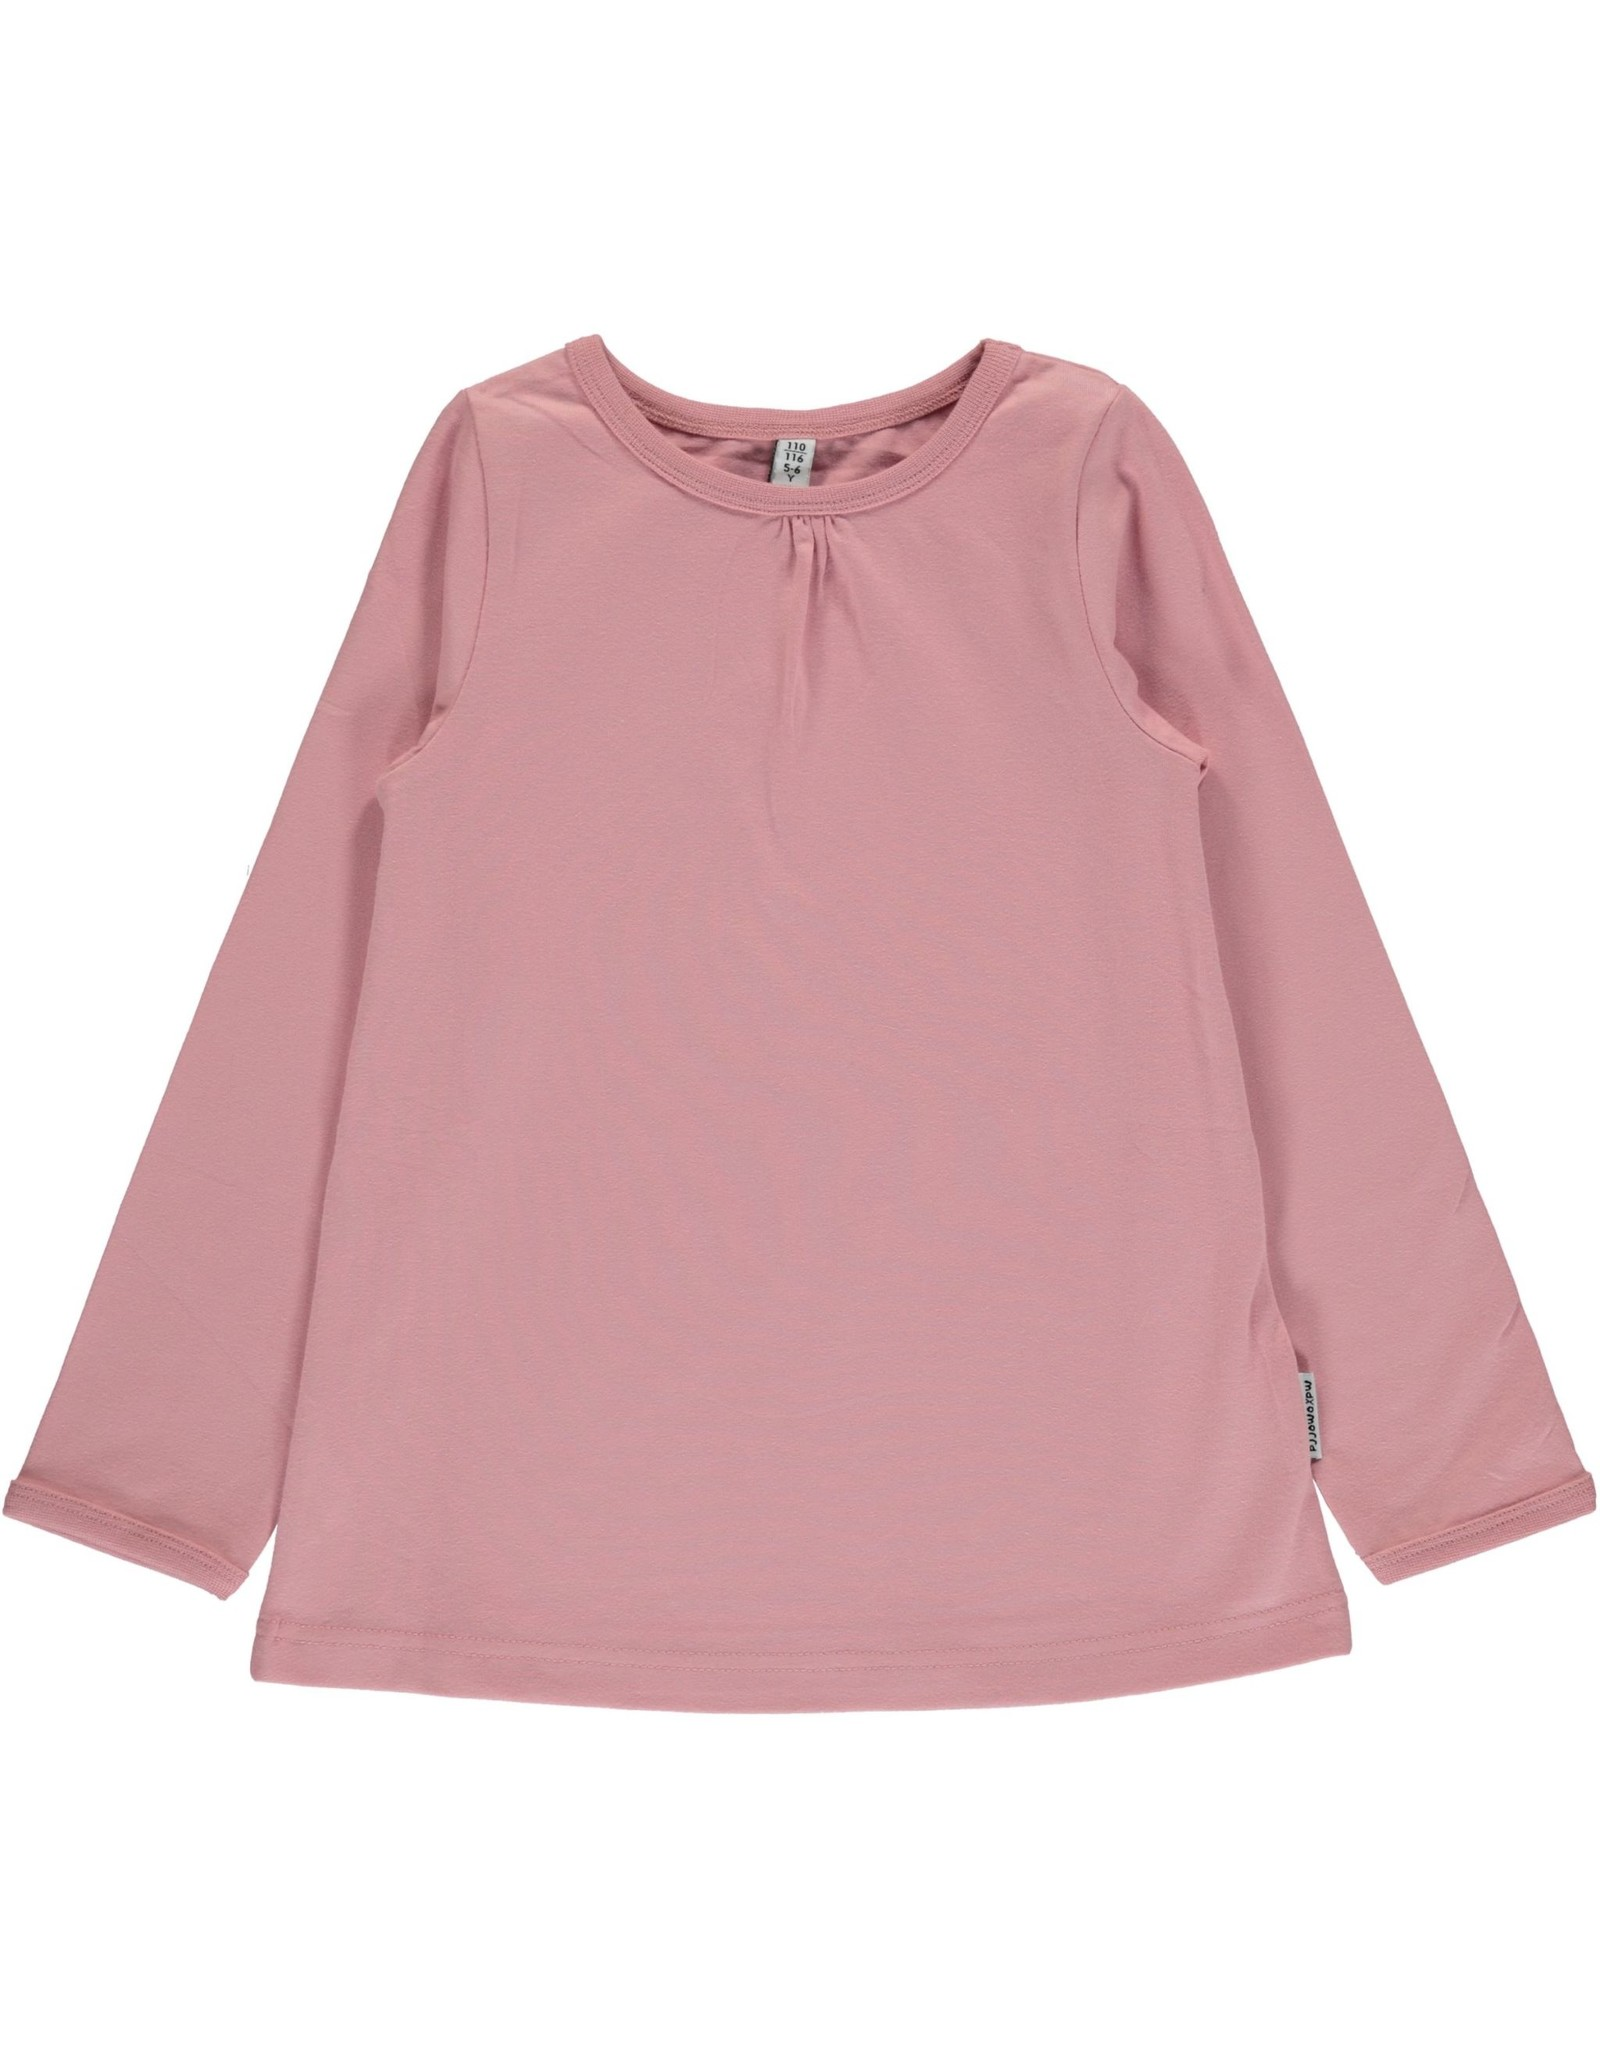 Maxomorra Maxomorra T-shirt Met Lange Mouwen Basic Roze